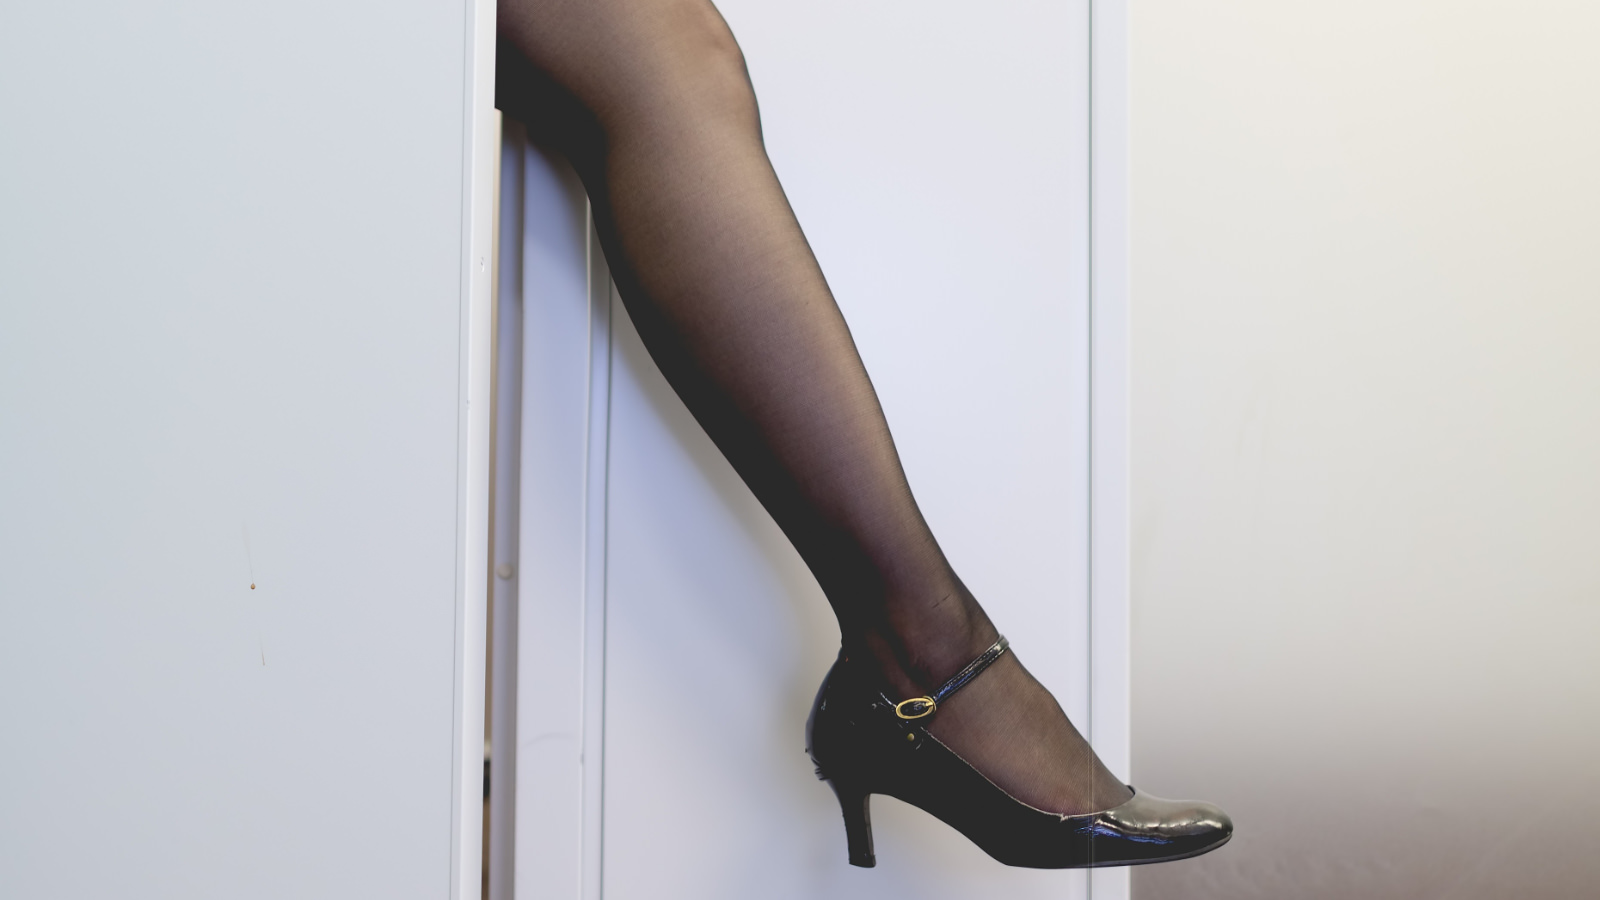 Day-of-stocking-pakutaso.jpg